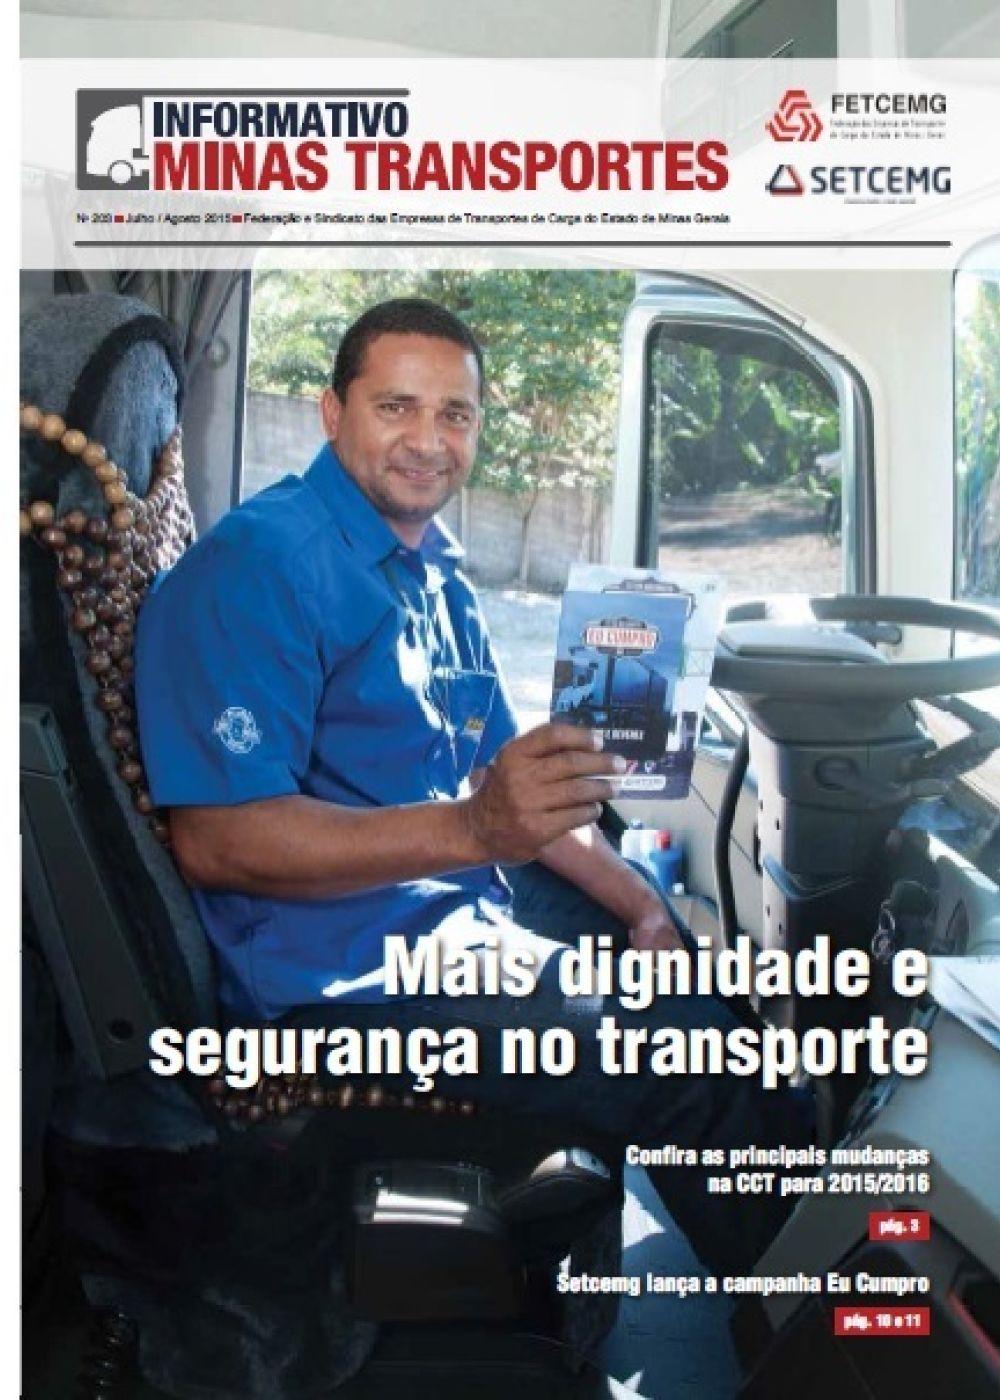 Informativo Minas Transportes - nº 203